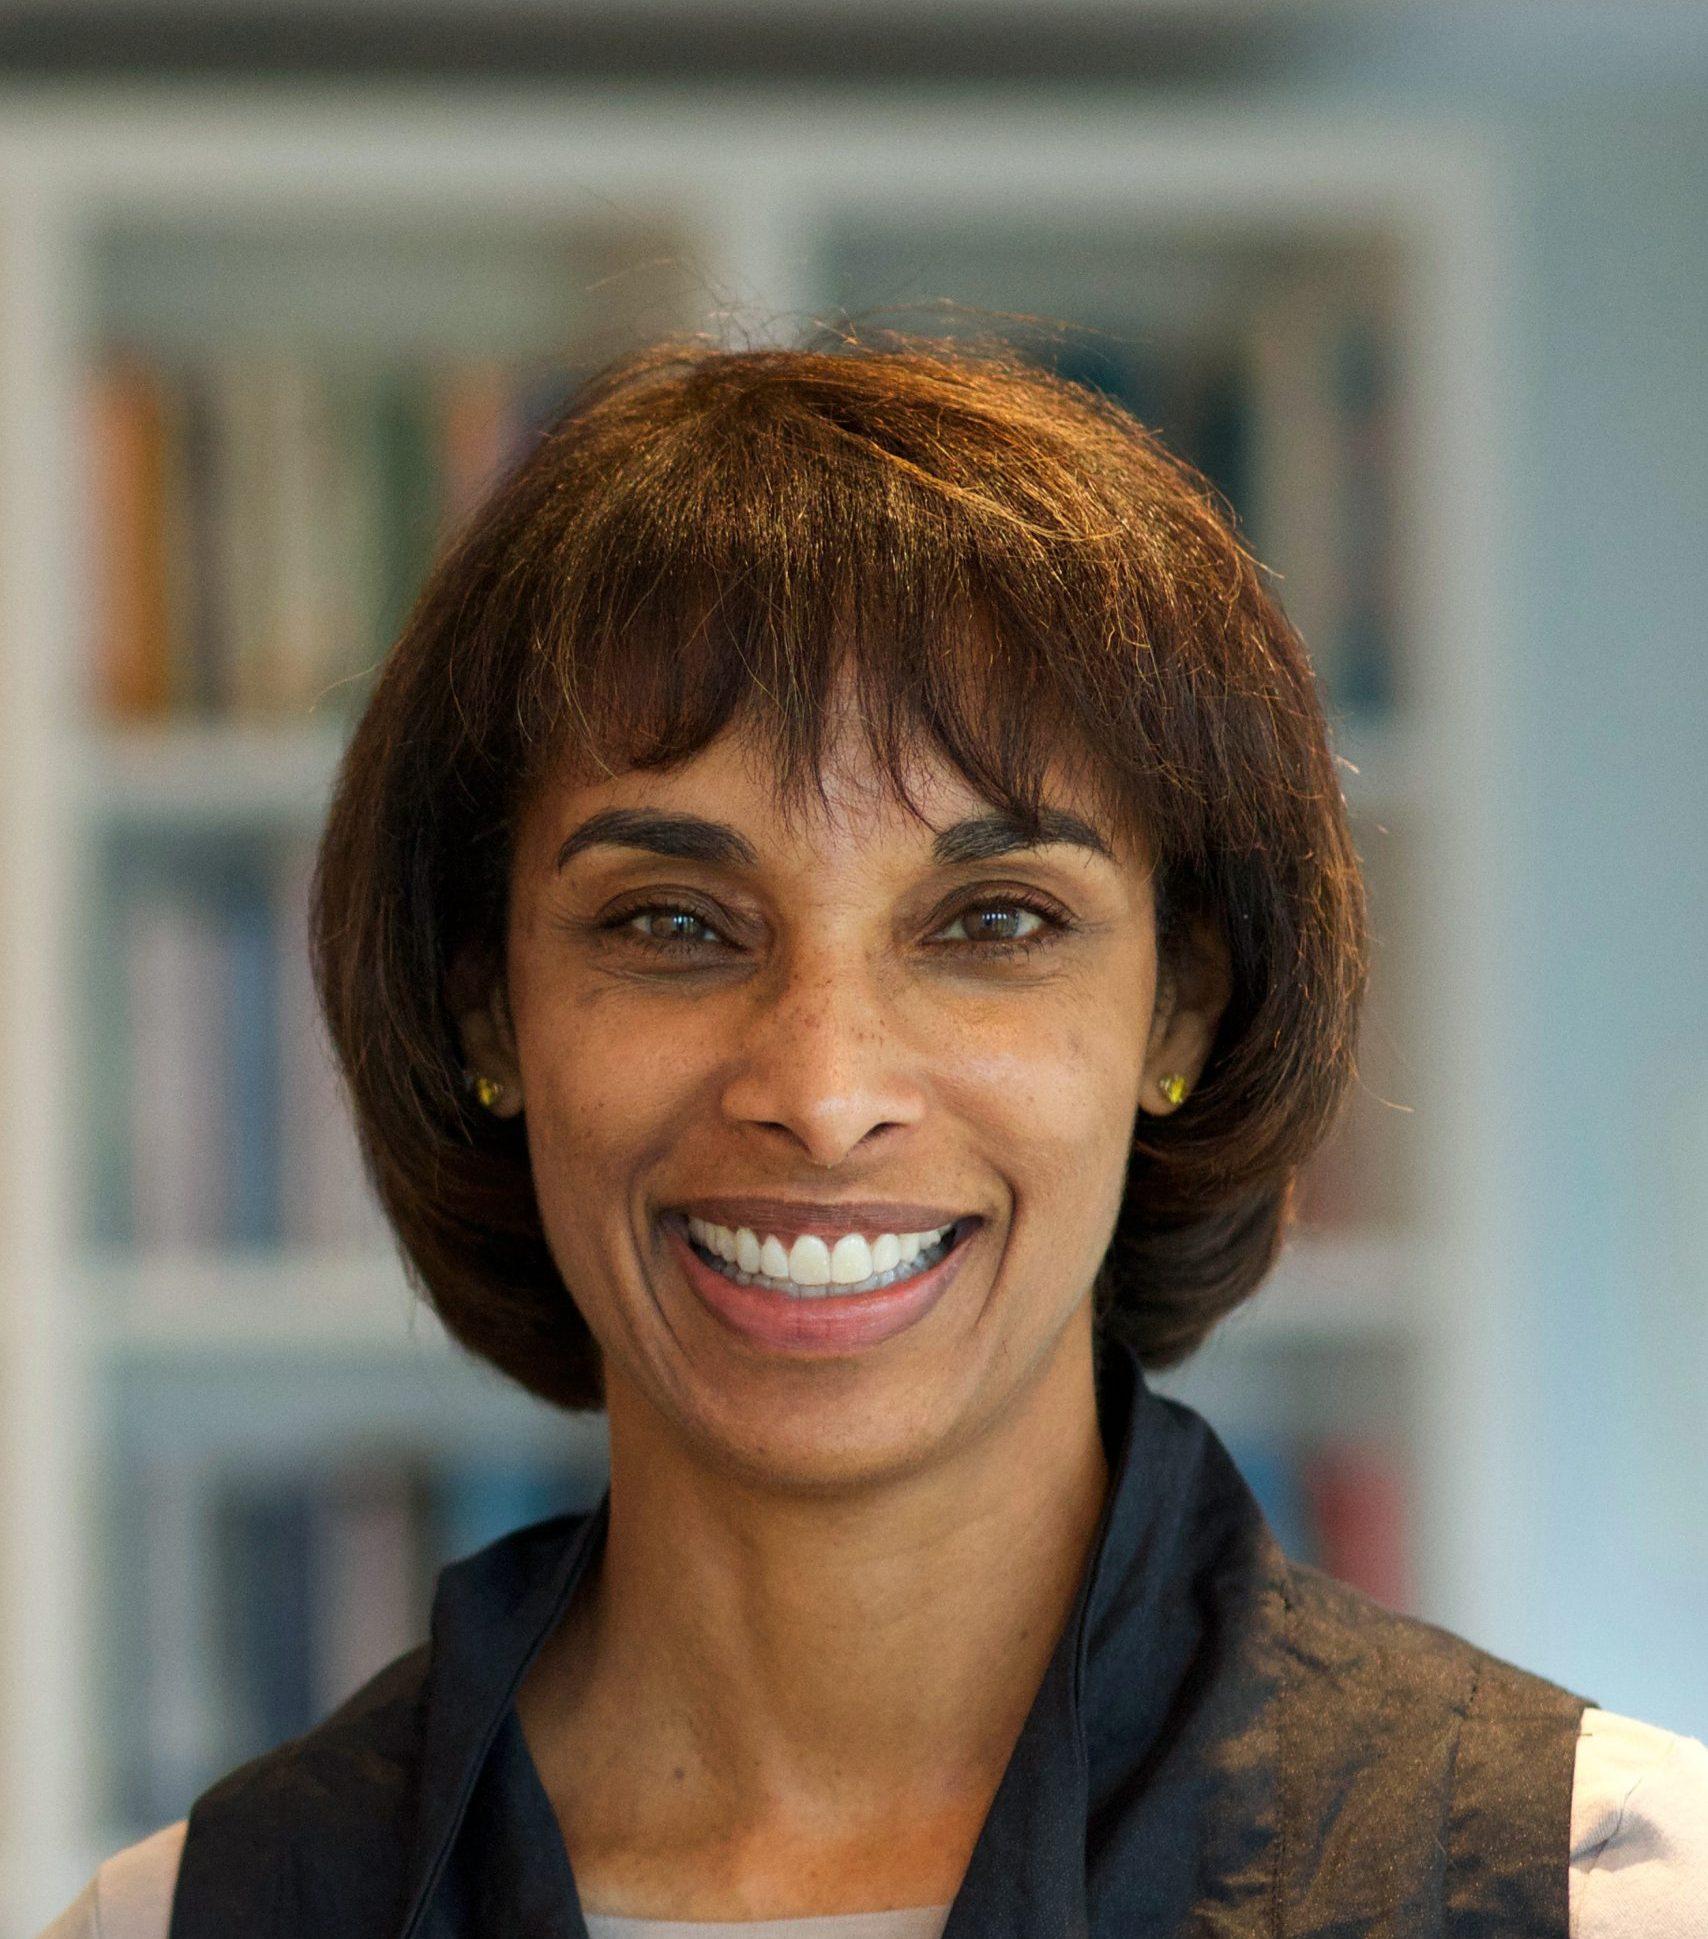 Cecilia Rouse - Chairman, Council of Economic Advisors